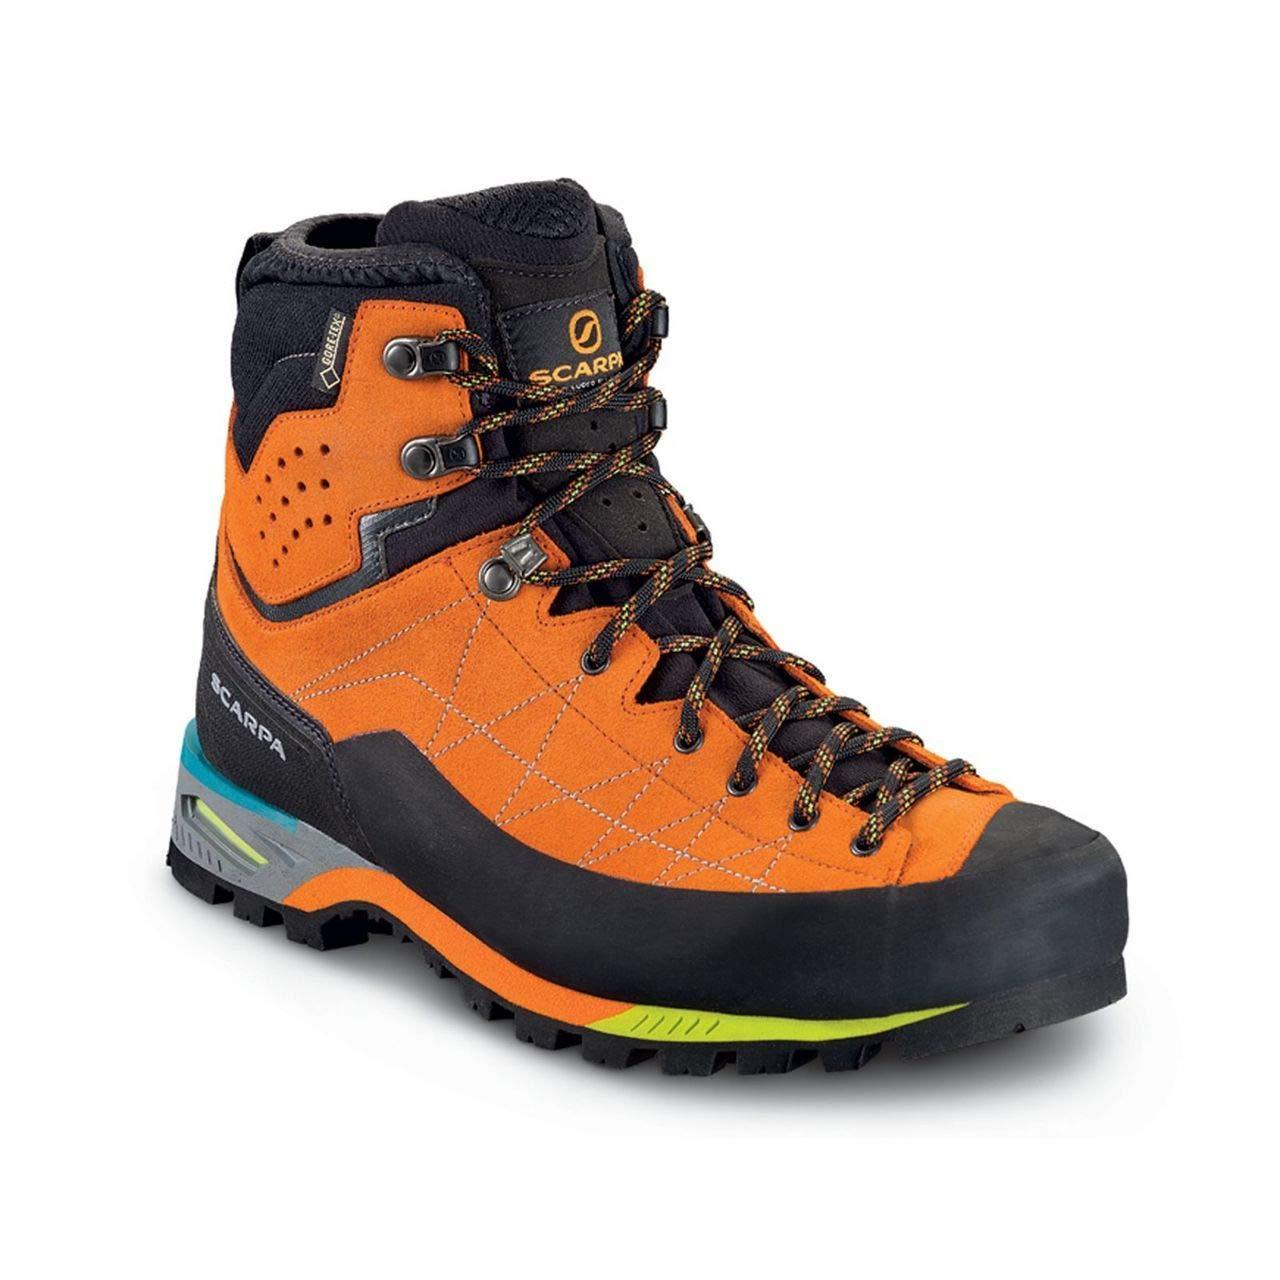 SCARPA Men's Zodiac TECH GTX Mountaineering Boot, Tonic, 44.5 EU/11 M US by SCARPA